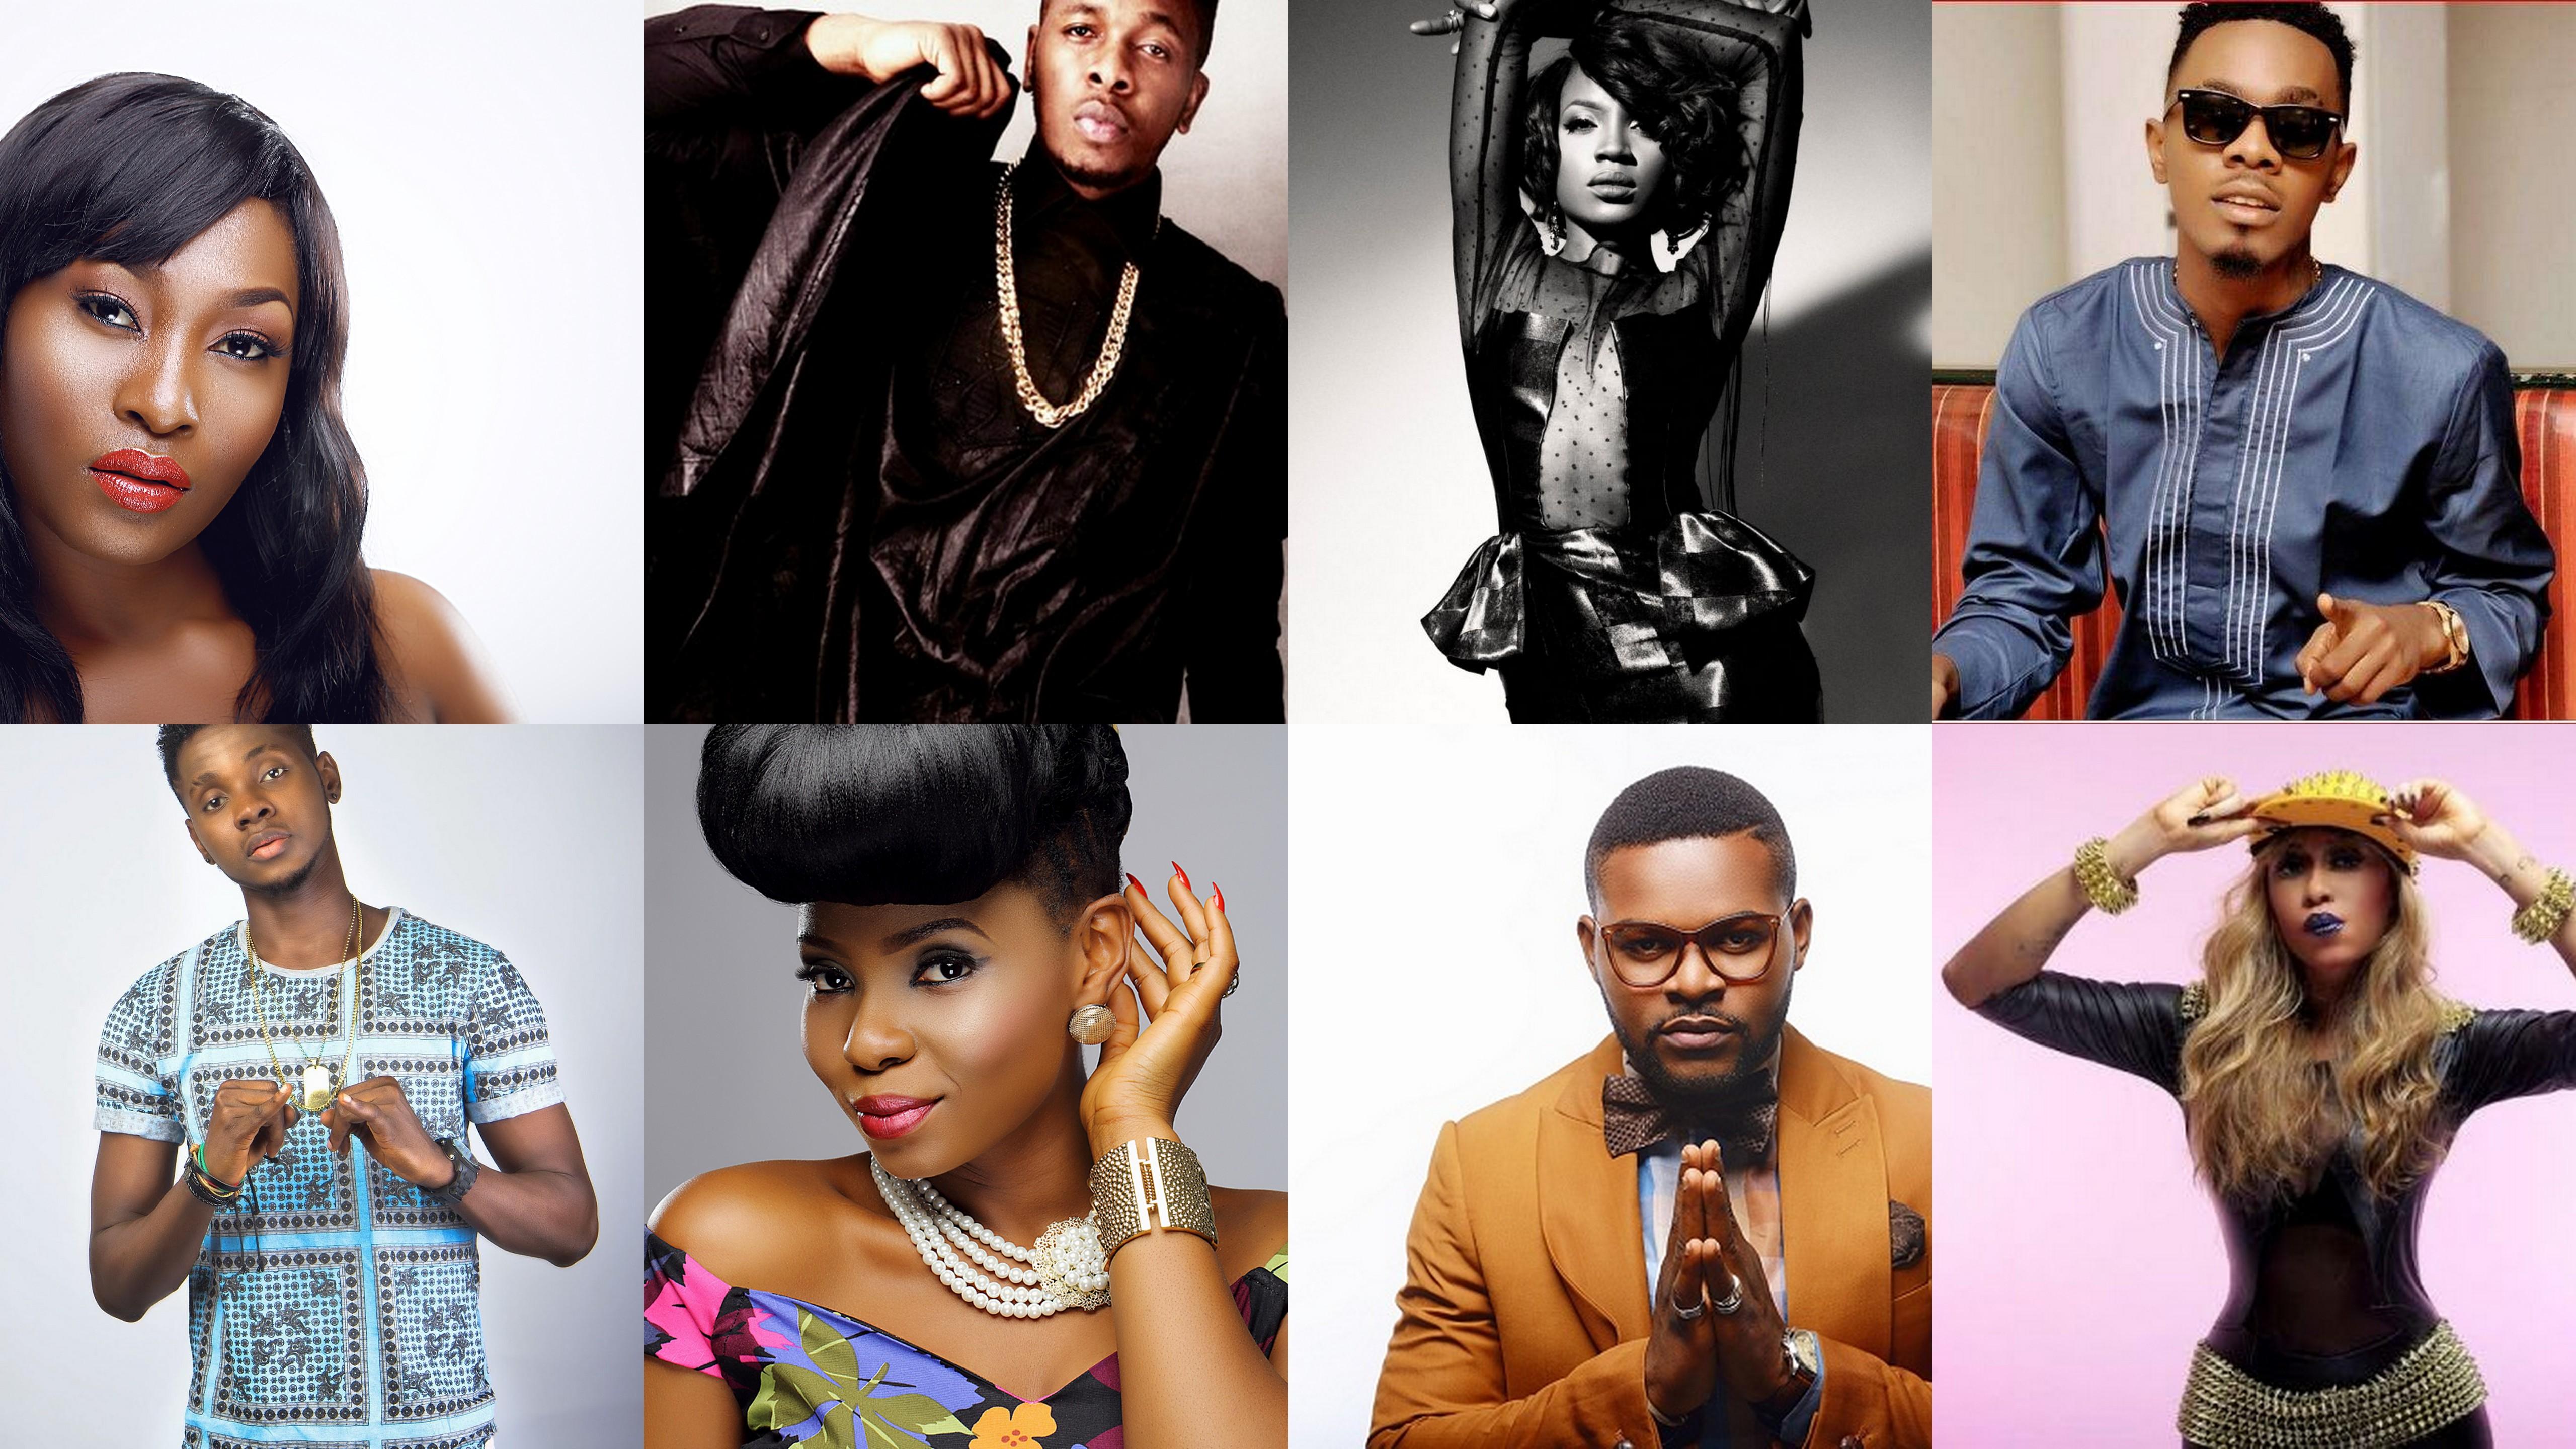 Nigerian artistes to watch in 2015